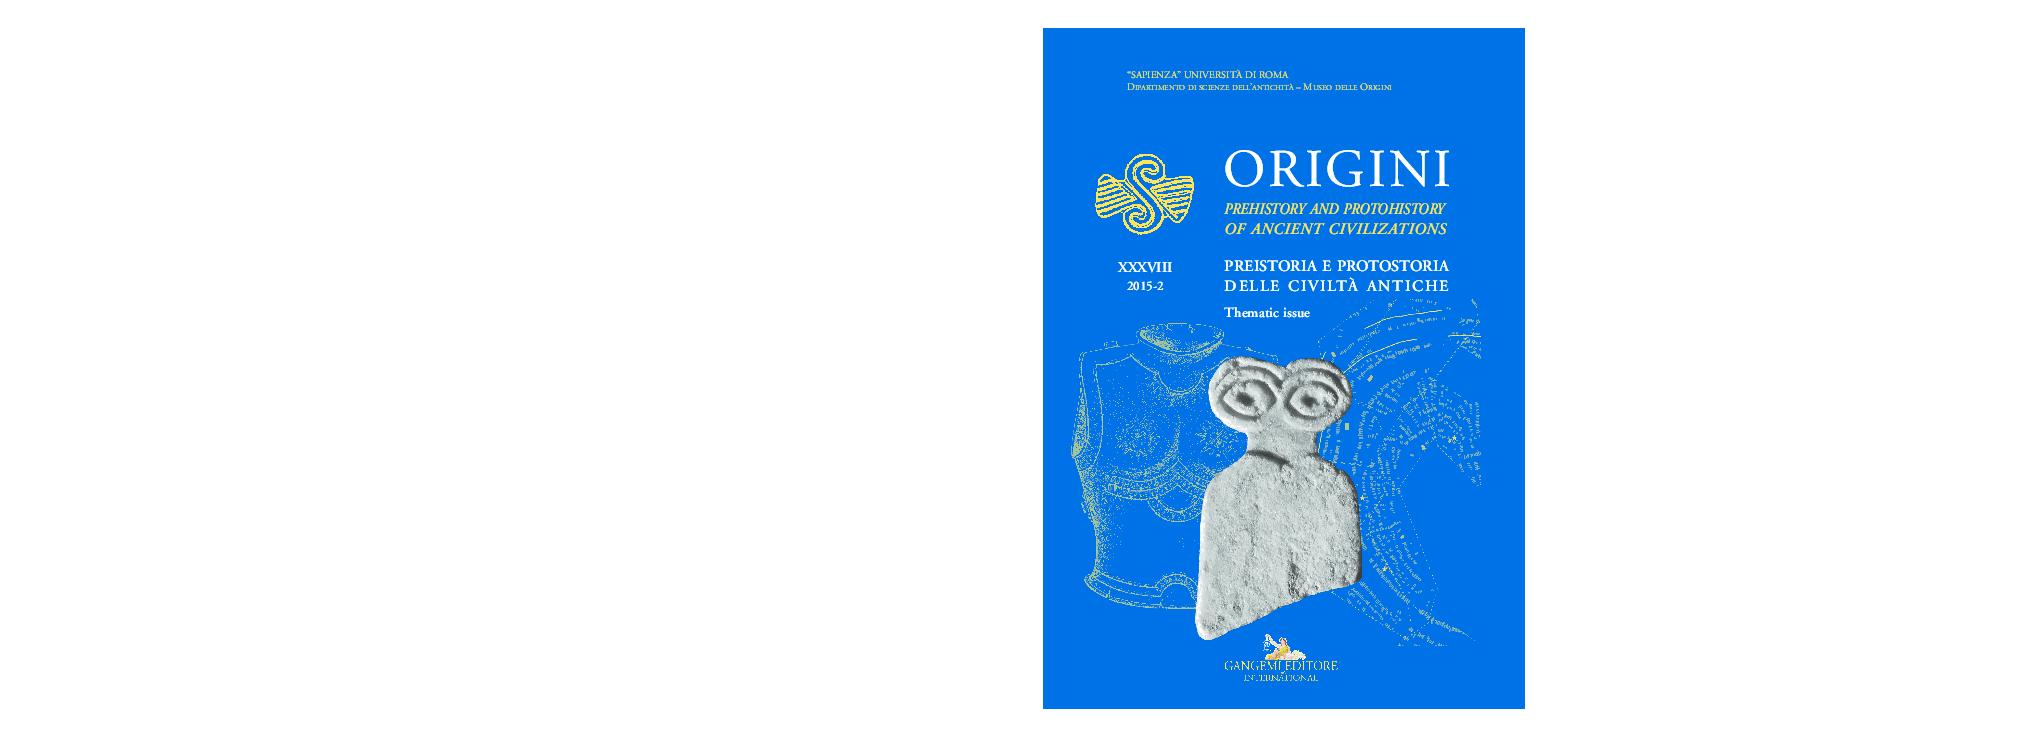 Studio Parisi E Associati Milano pdf) different forms of social inequality in bronze age